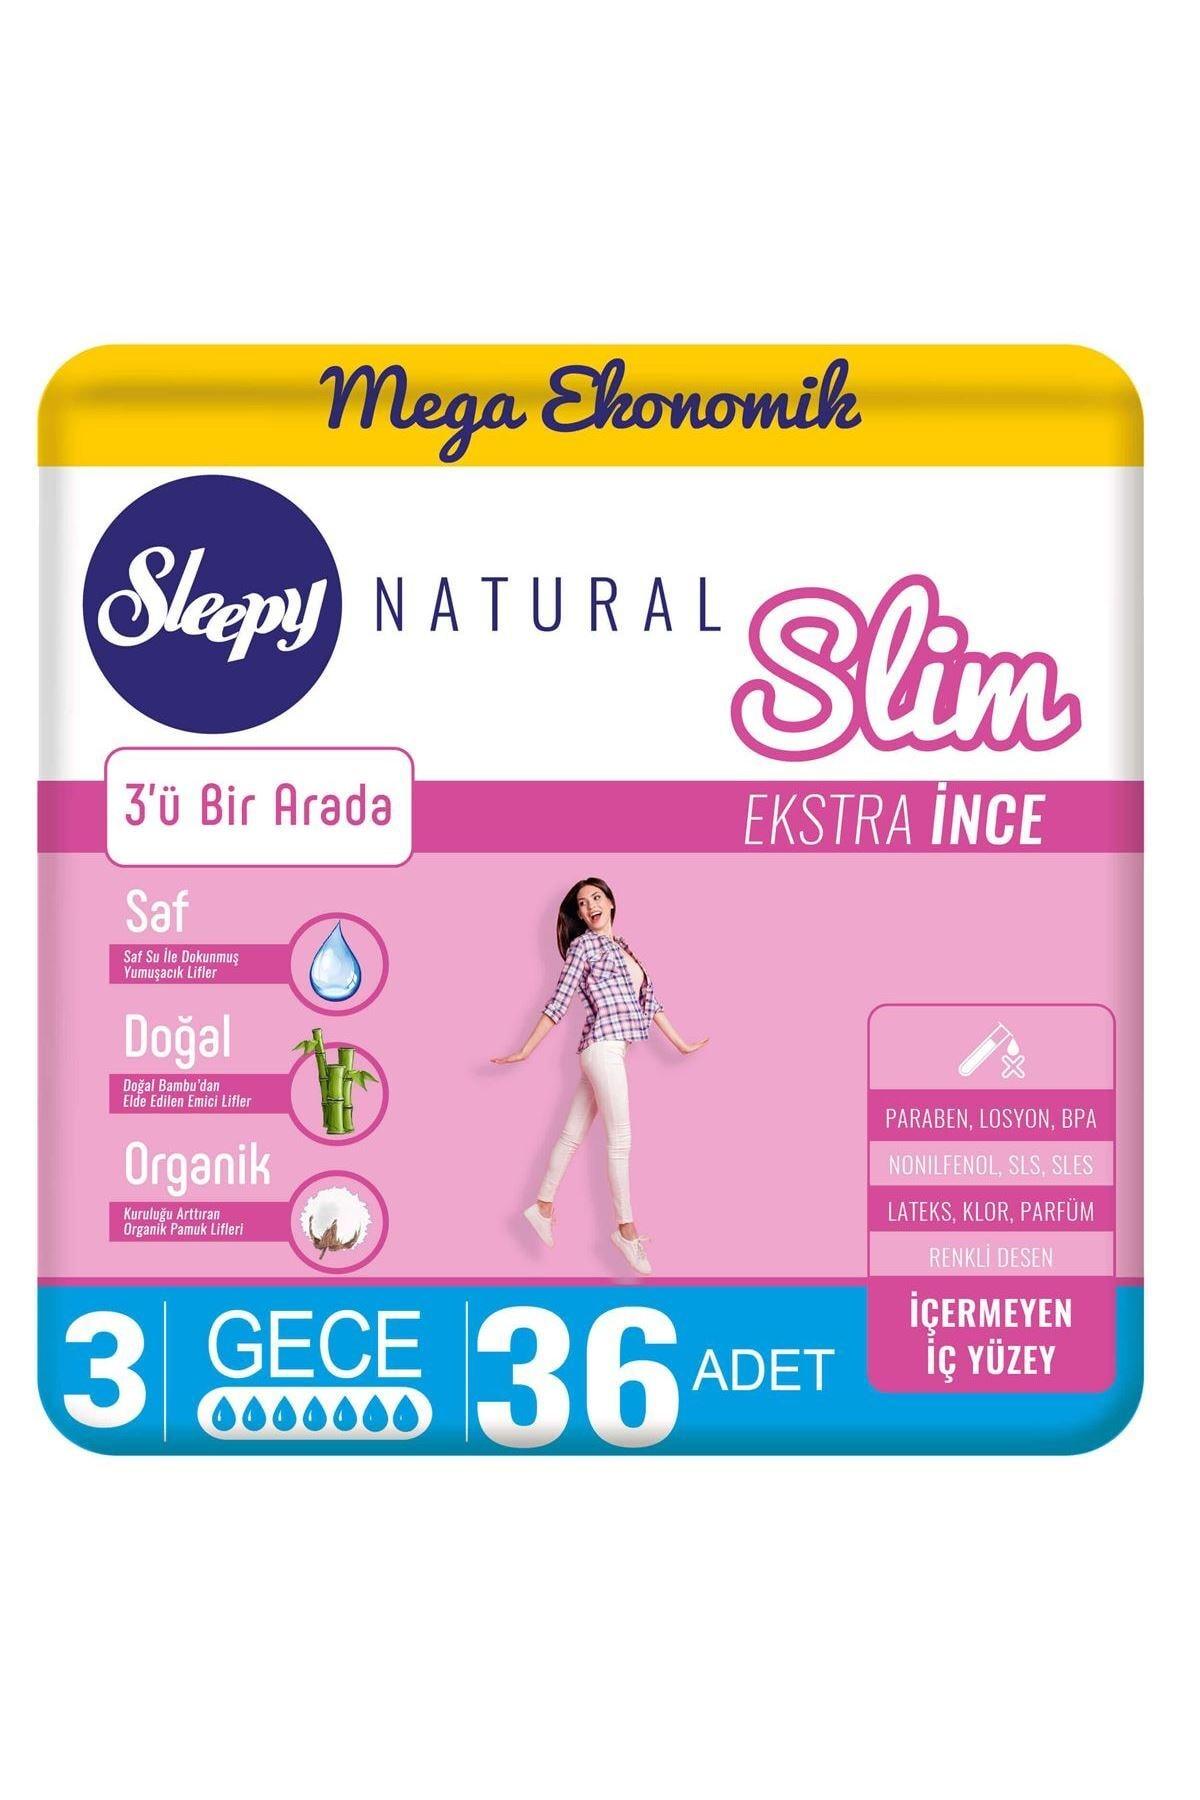 Sleepy Natural Slim Ekstra Ince Gece36 Ped 0